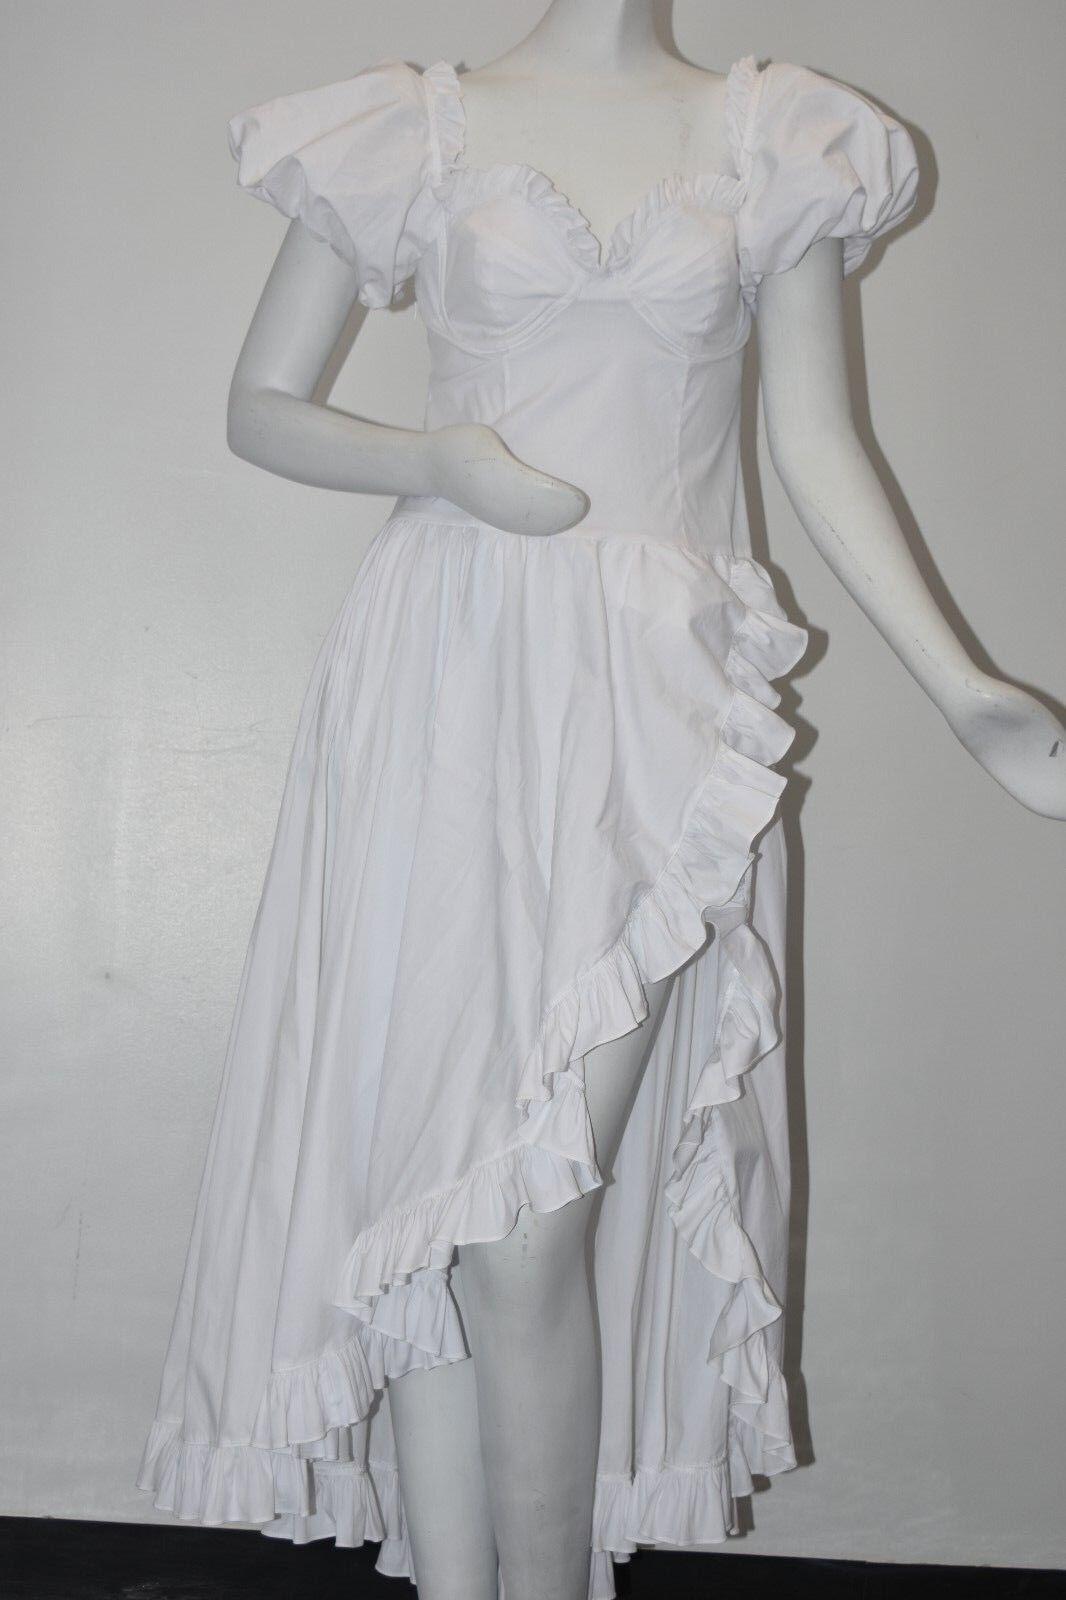 NEW CAROLINE CONSTAS White Cotton High Low Slit Full Maxi Dress Ruffles  S